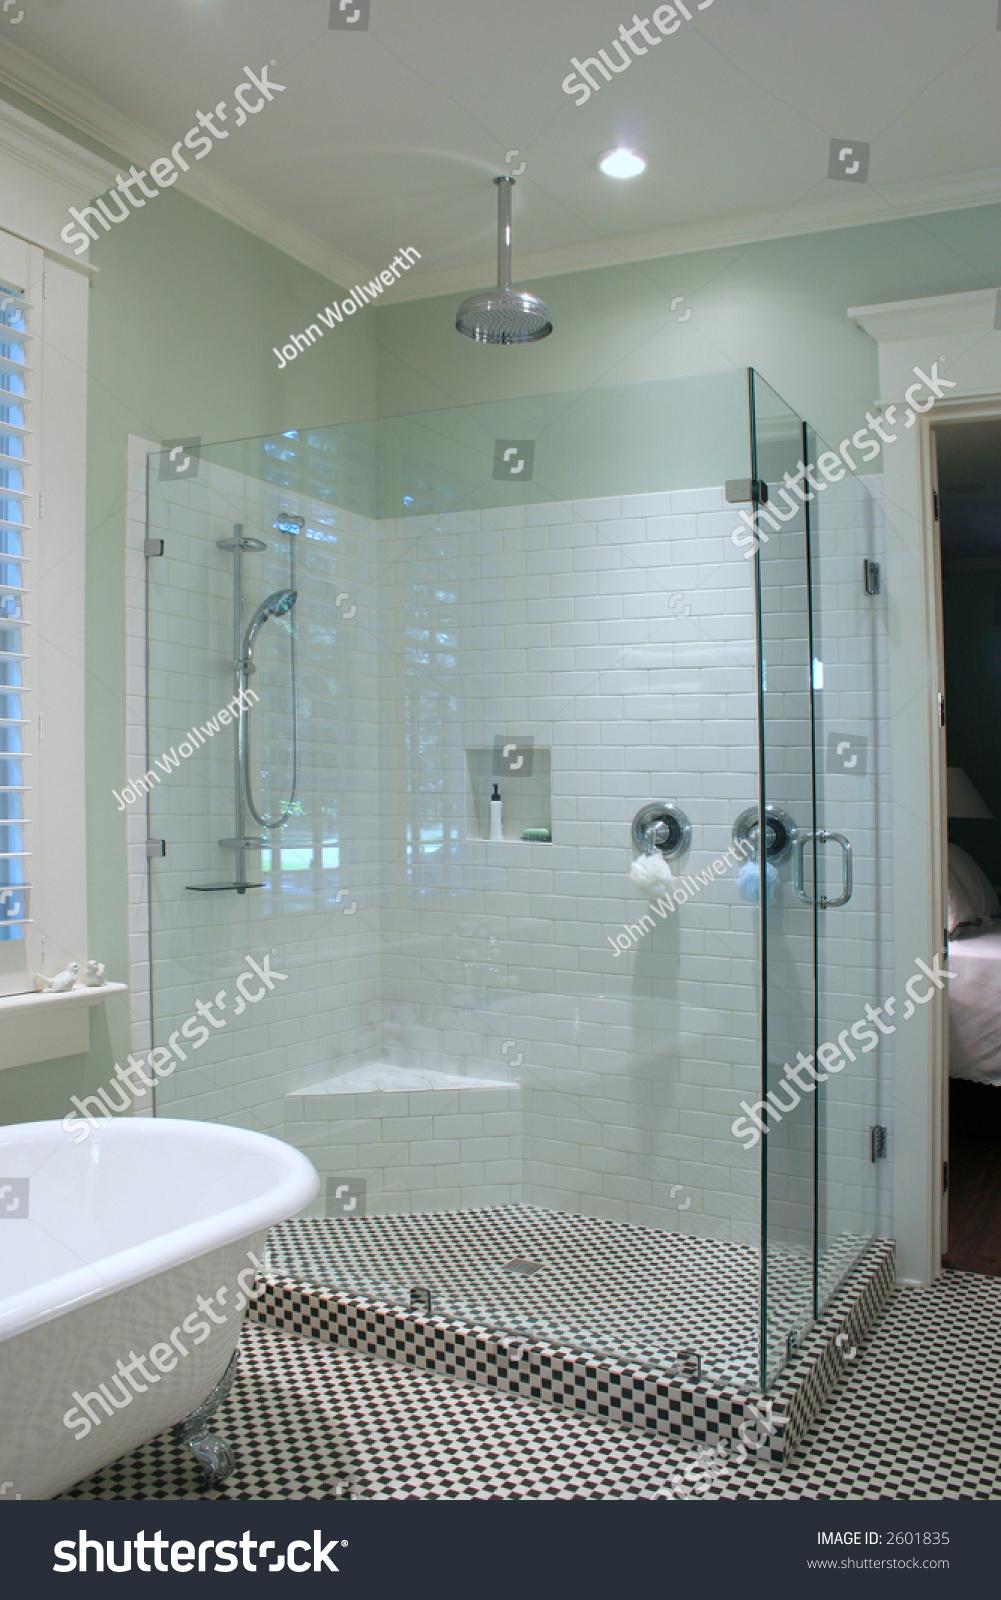 Bathroom Black White Tile Glass Stock Photo (Royalty Free) 2601835 ...